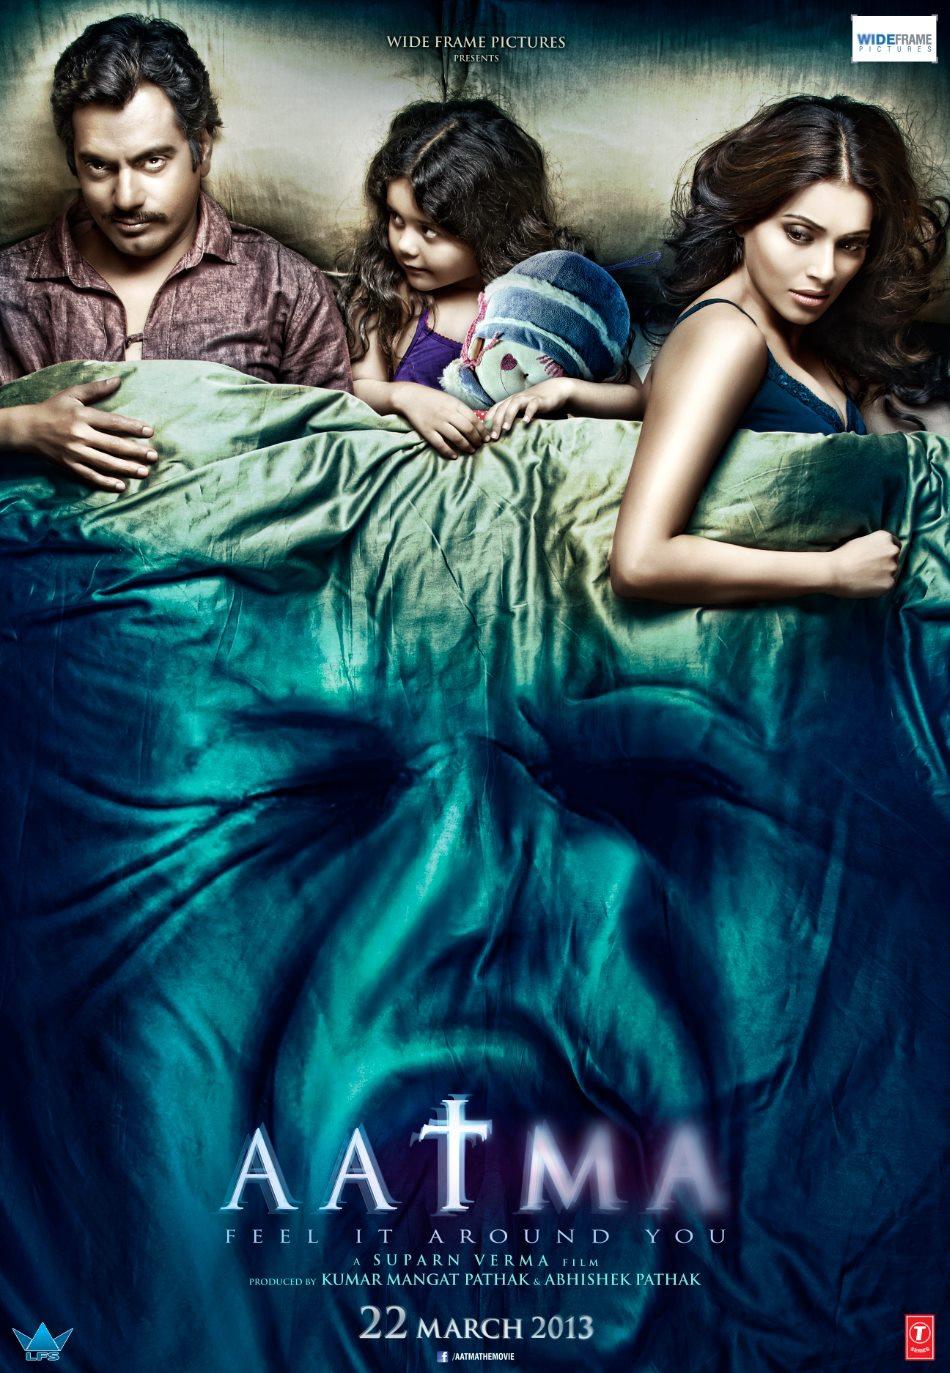 Aatma - Movie Poster #2 (Original)